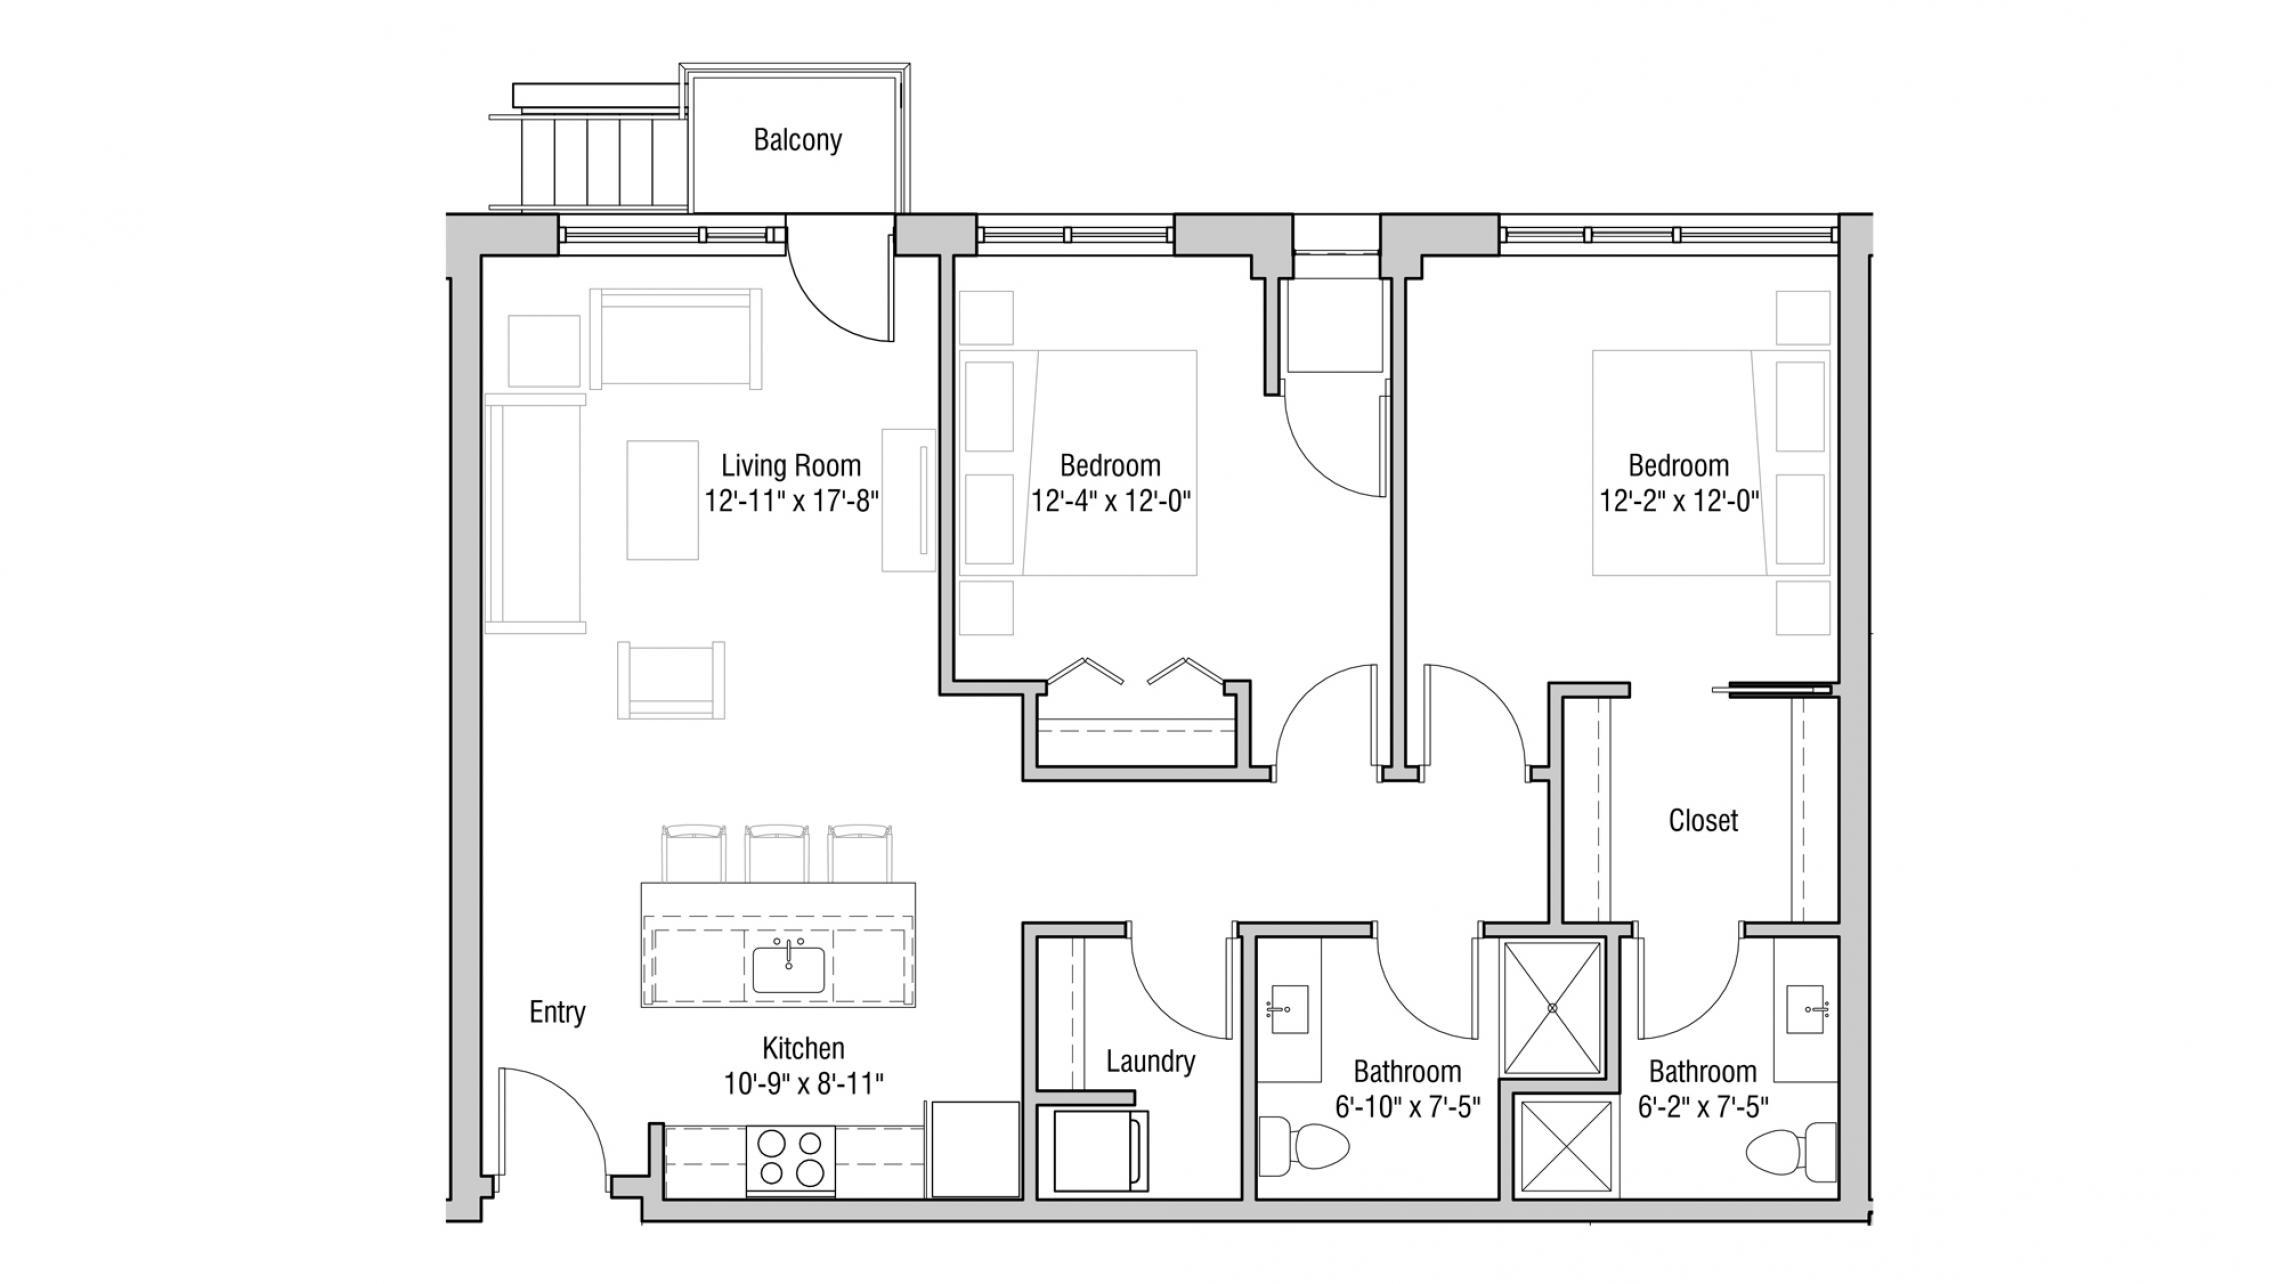 ULI Quarter Row 117 - Two Bedroom, Two Bathroom